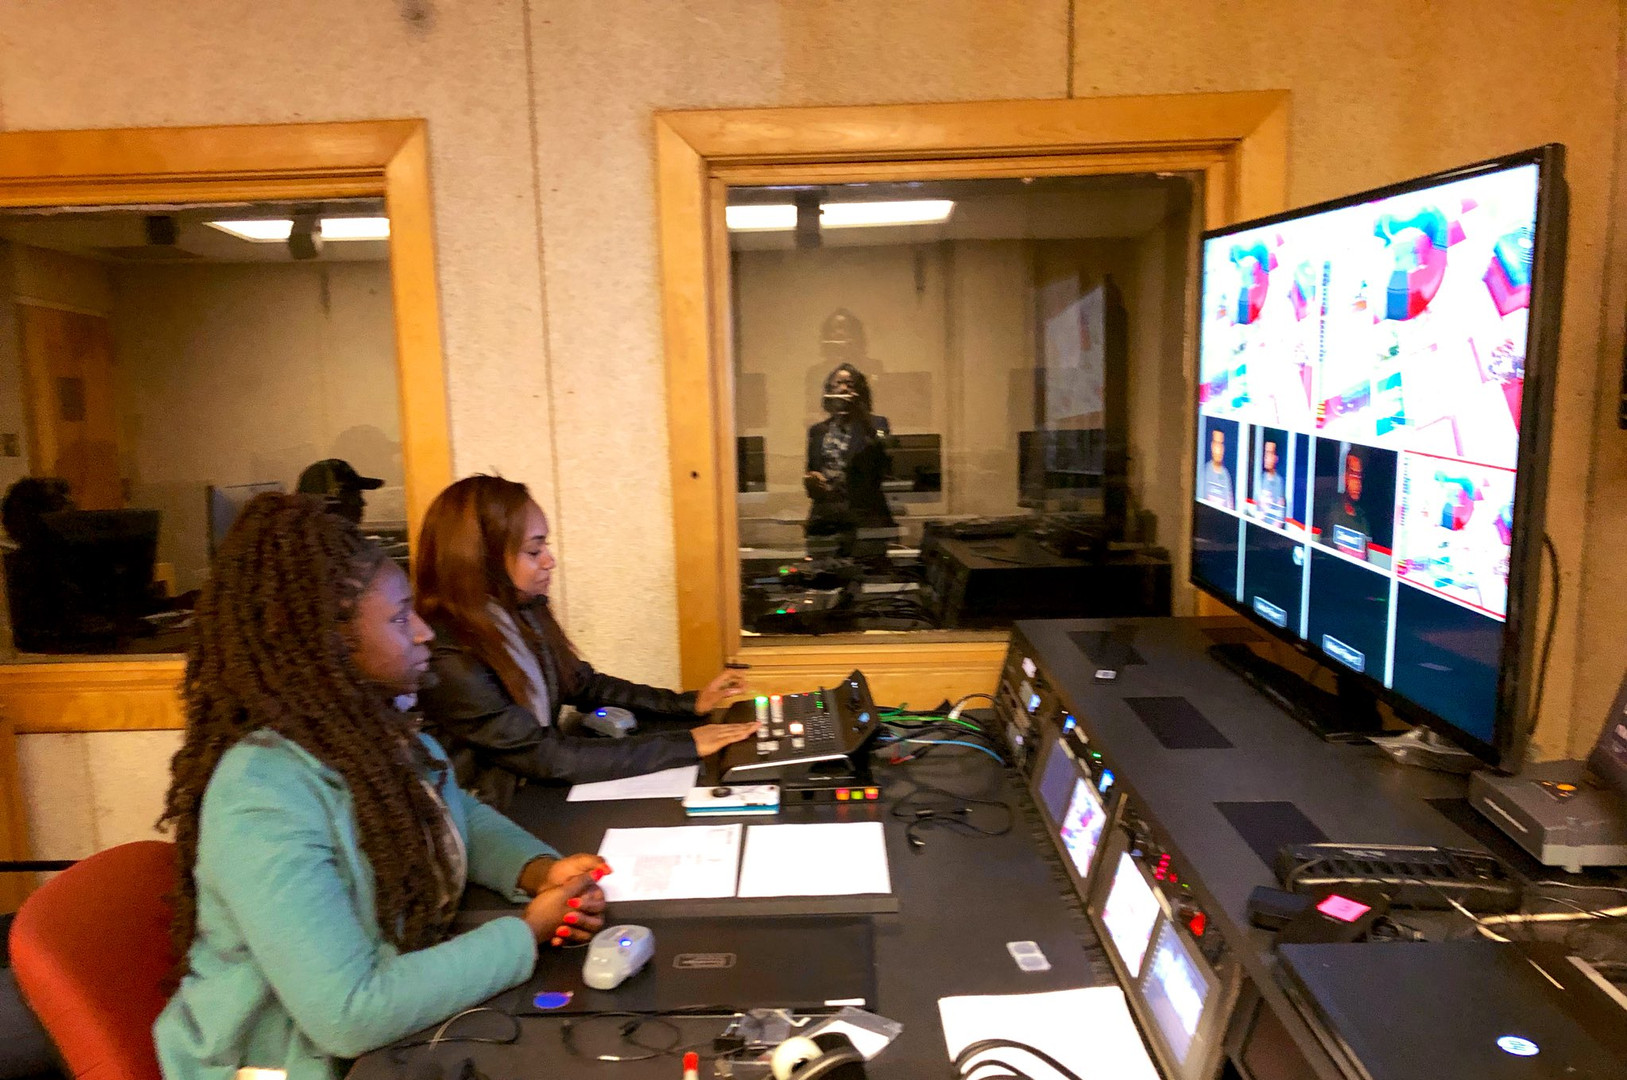 sydney and noni in studio.jpeg